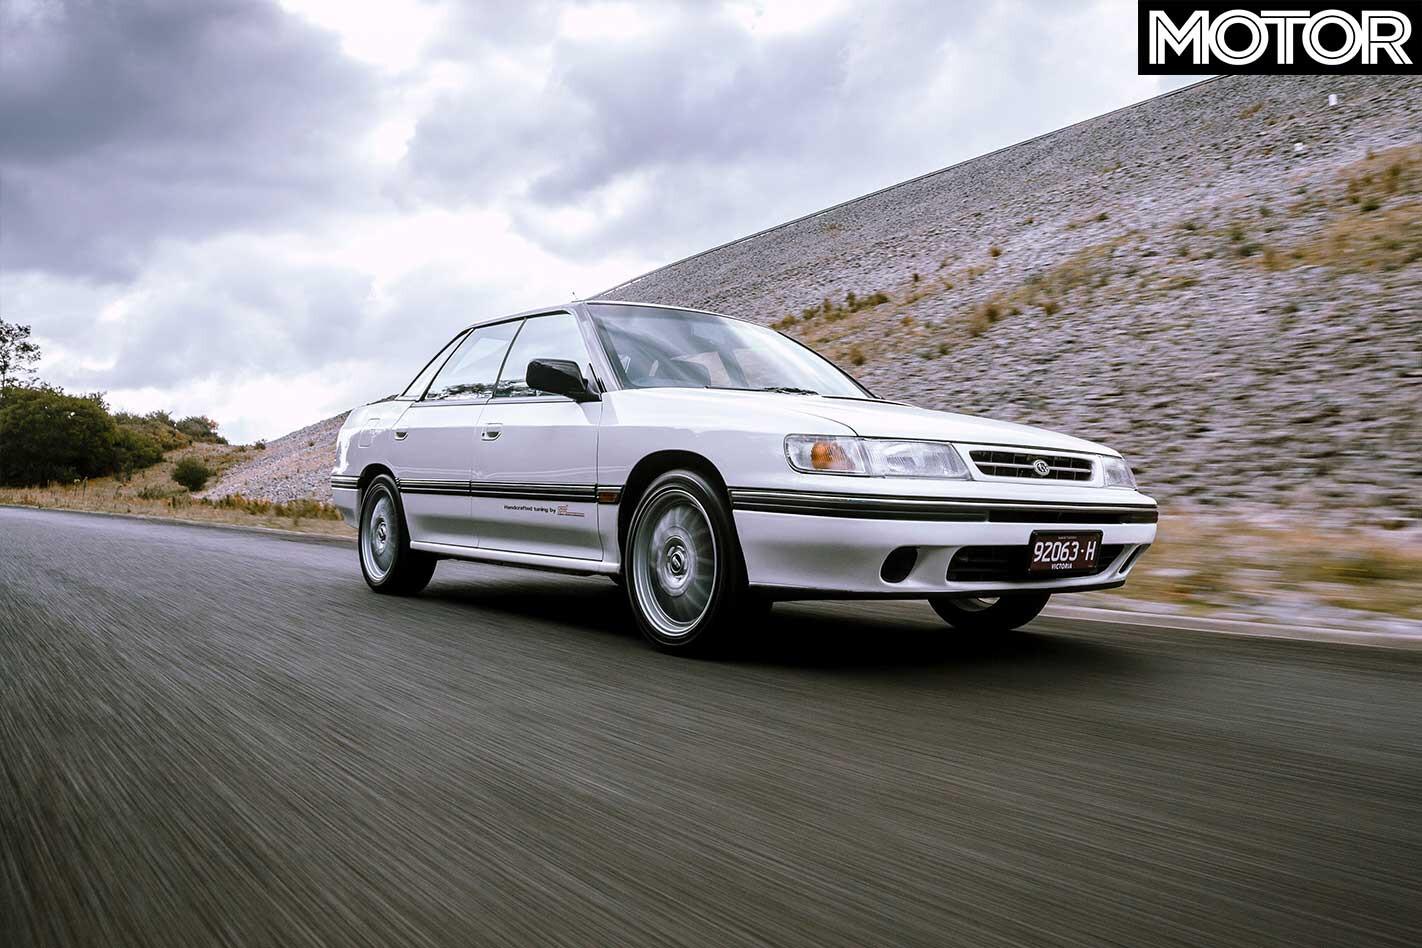 1990 Subaru Legacy RS RA Front Jpg